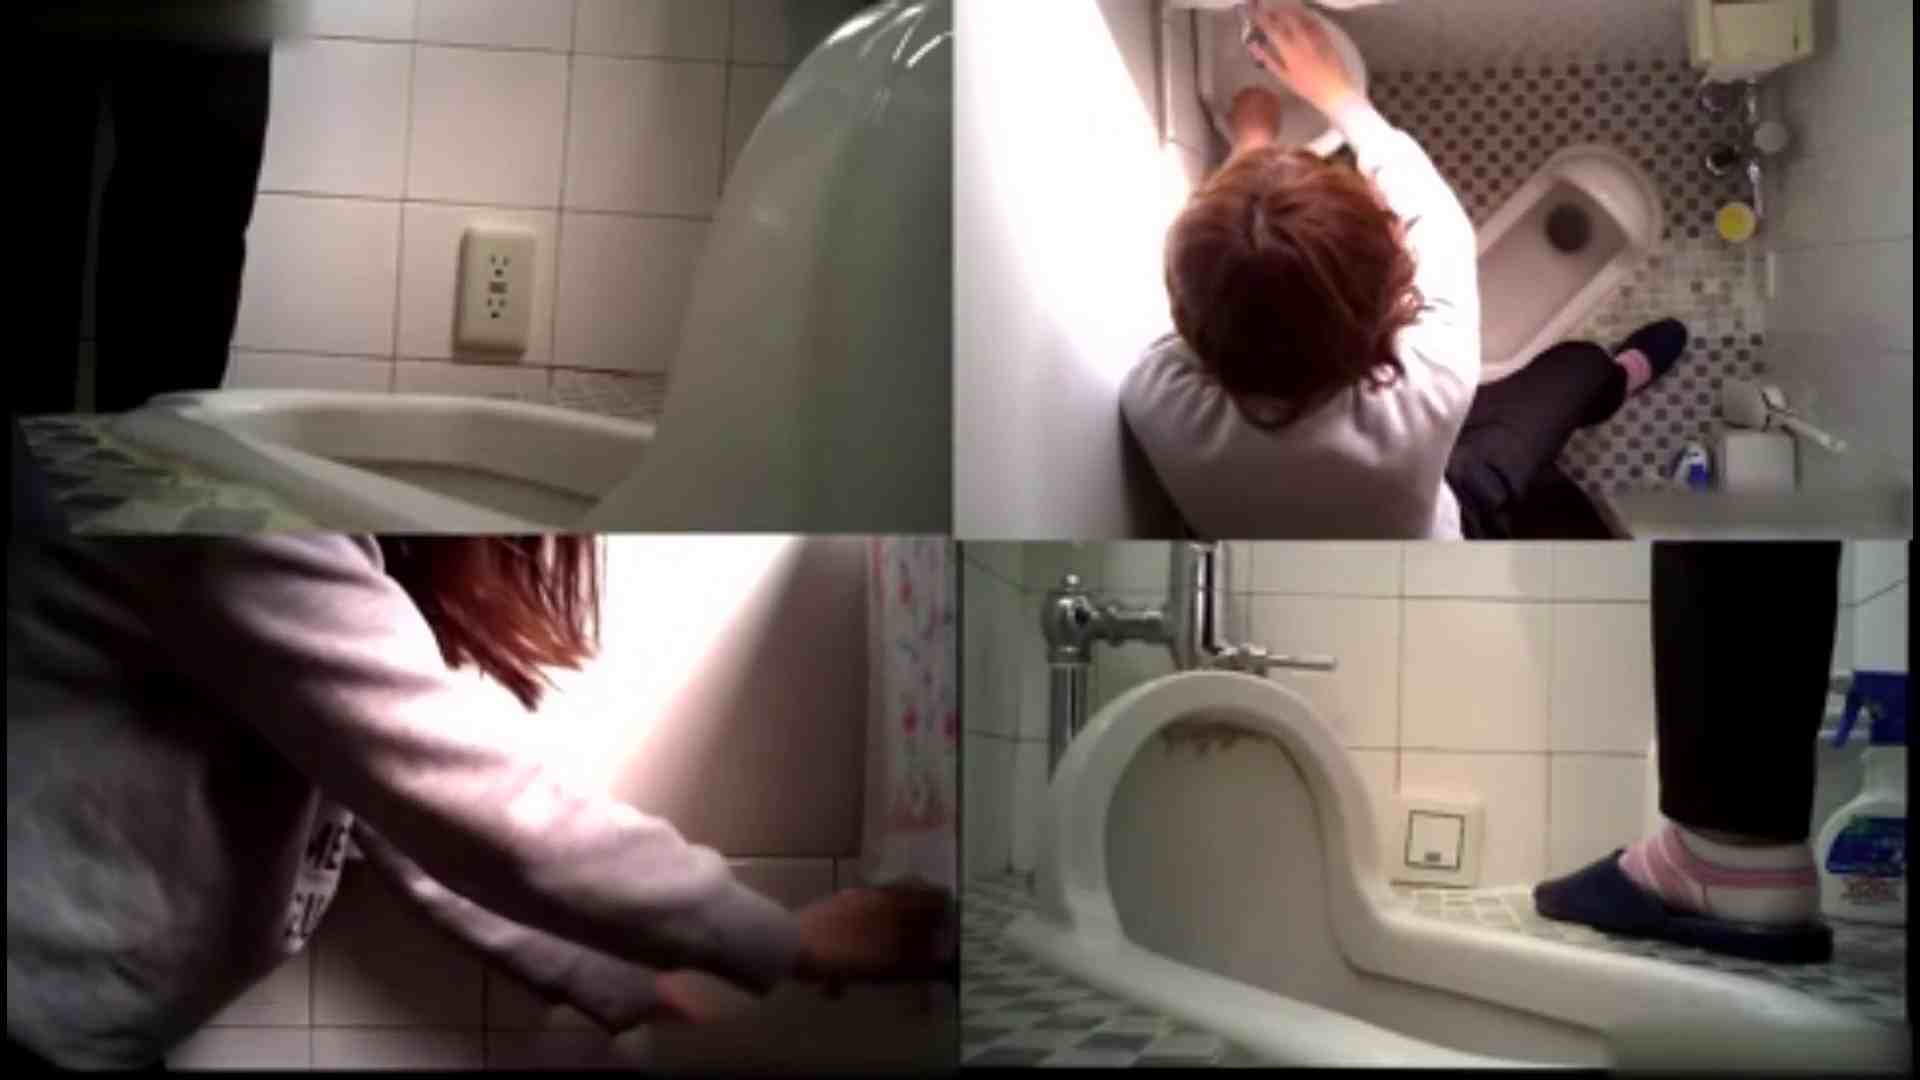 Vol.05 花の女子大生 トイレ恥態 進化系マルチアングル!! 盛合せ オメコ無修正動画無料 101枚 28